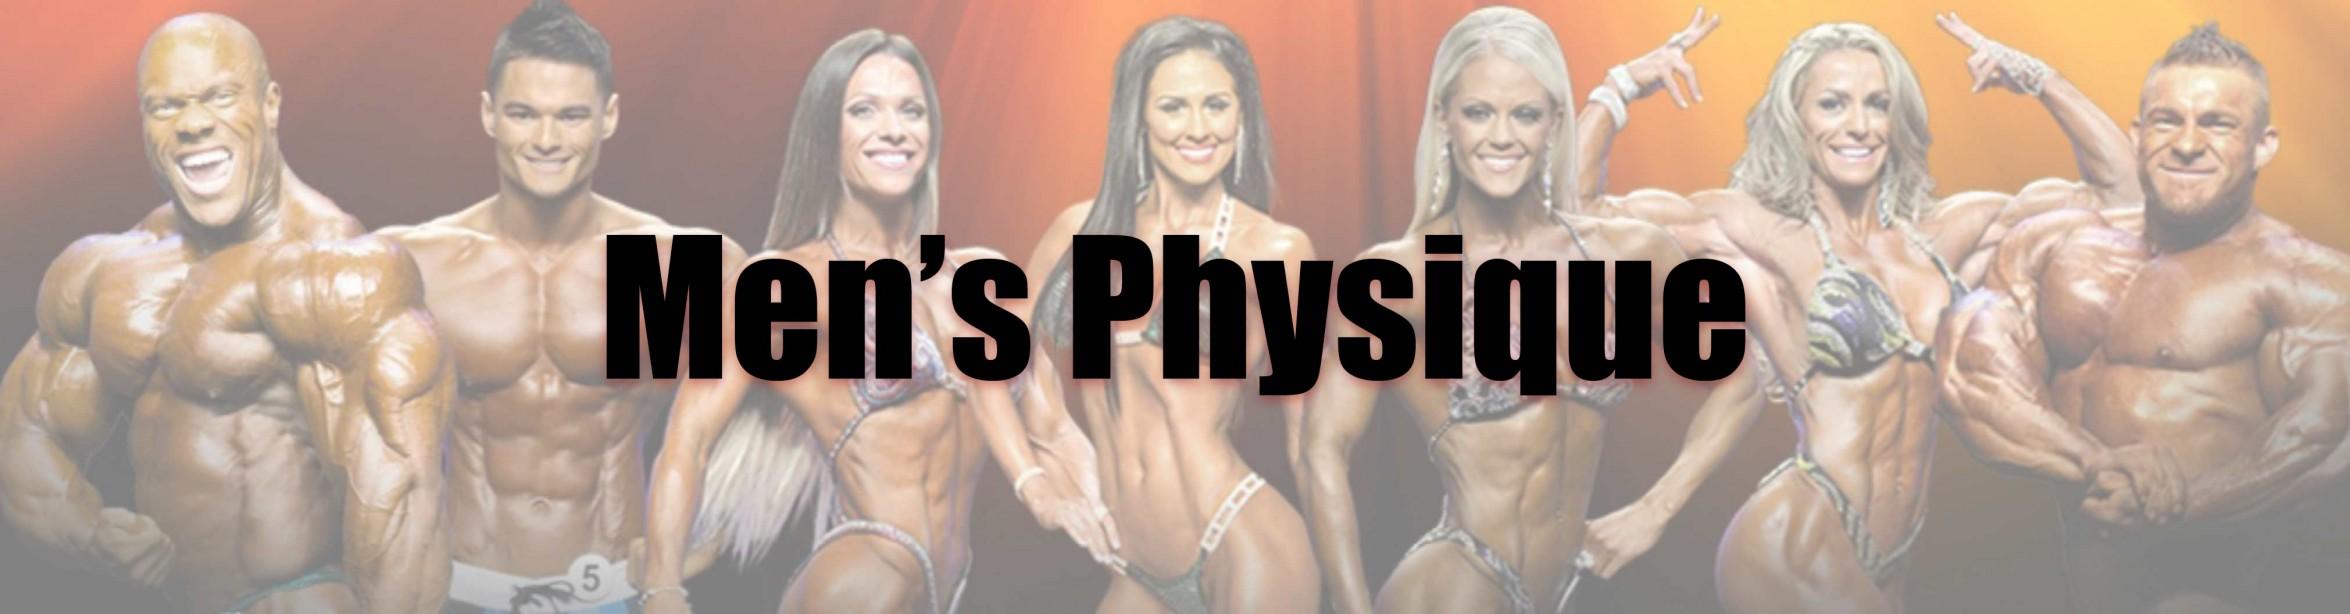 2015 Men's Physique Showdown Call Out Report